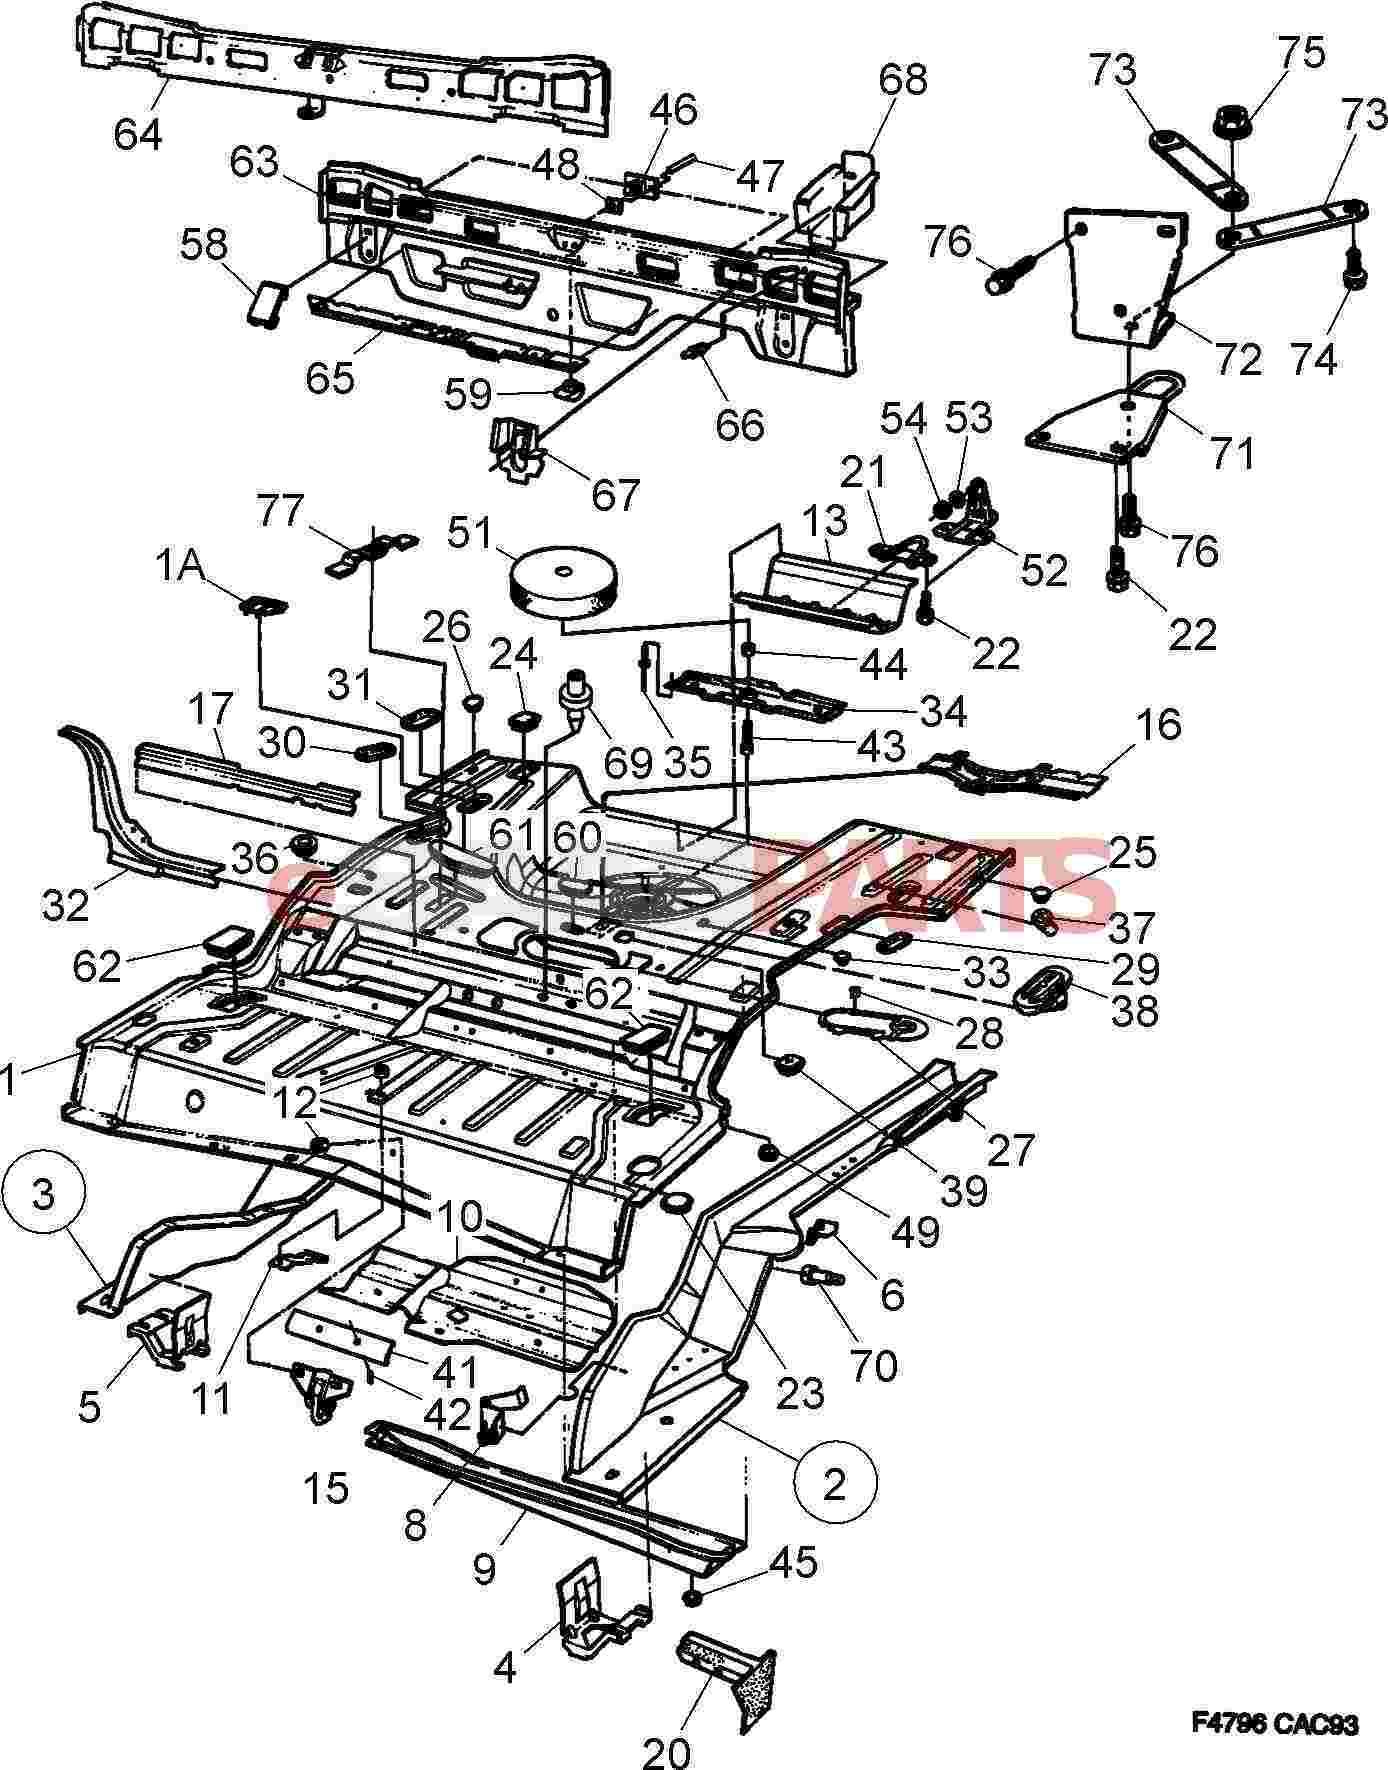 9271263 saab cover plate genuine saab parts from esaabparts